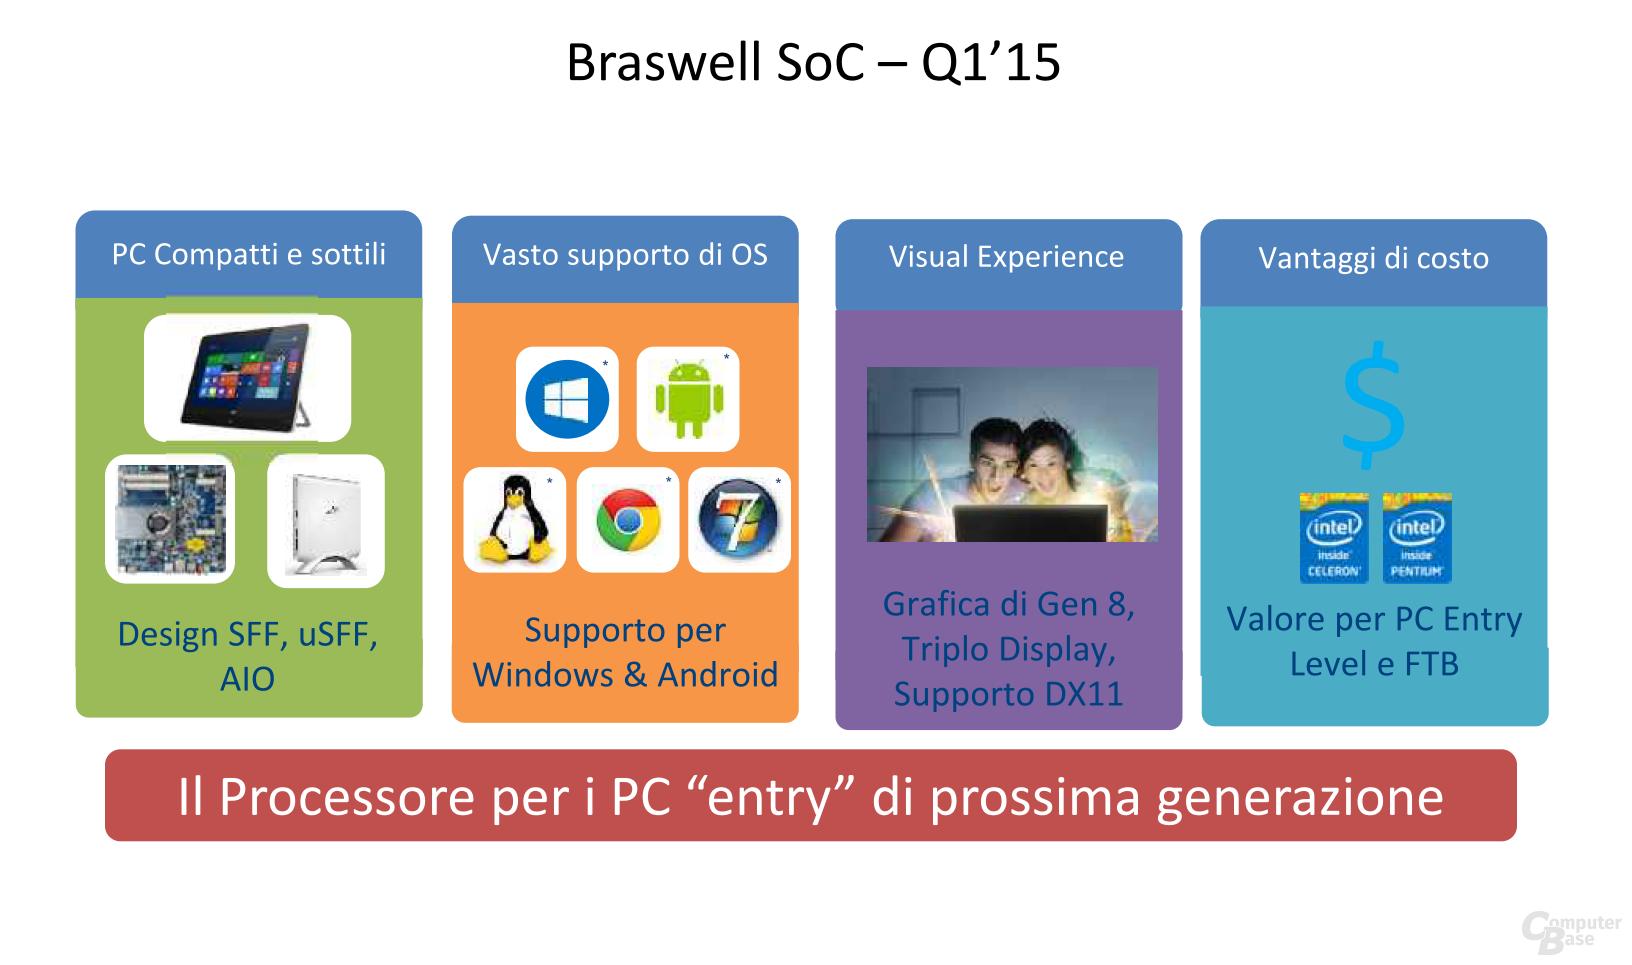 Braswell SoC ab Q1 2015